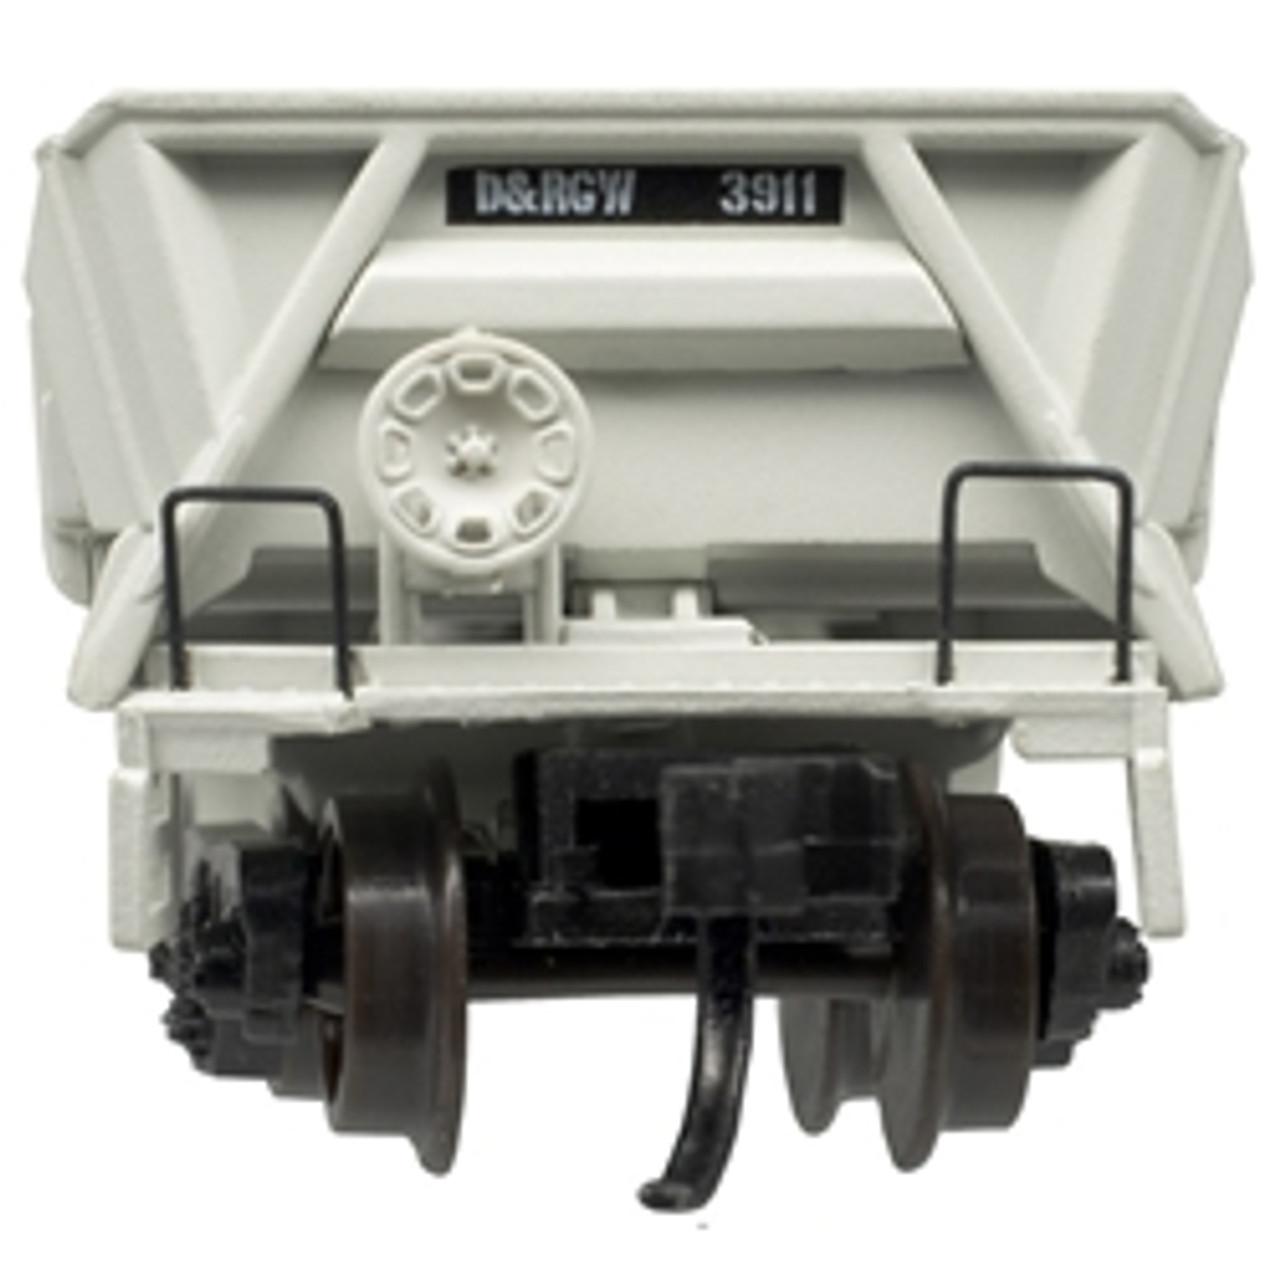 ATLAS 50004587 DIFCO Side Dump Car - D&RGW Denver & Rio Grande Western (UP Shield) #3911 (SCALE=N) Part # 150-50004587